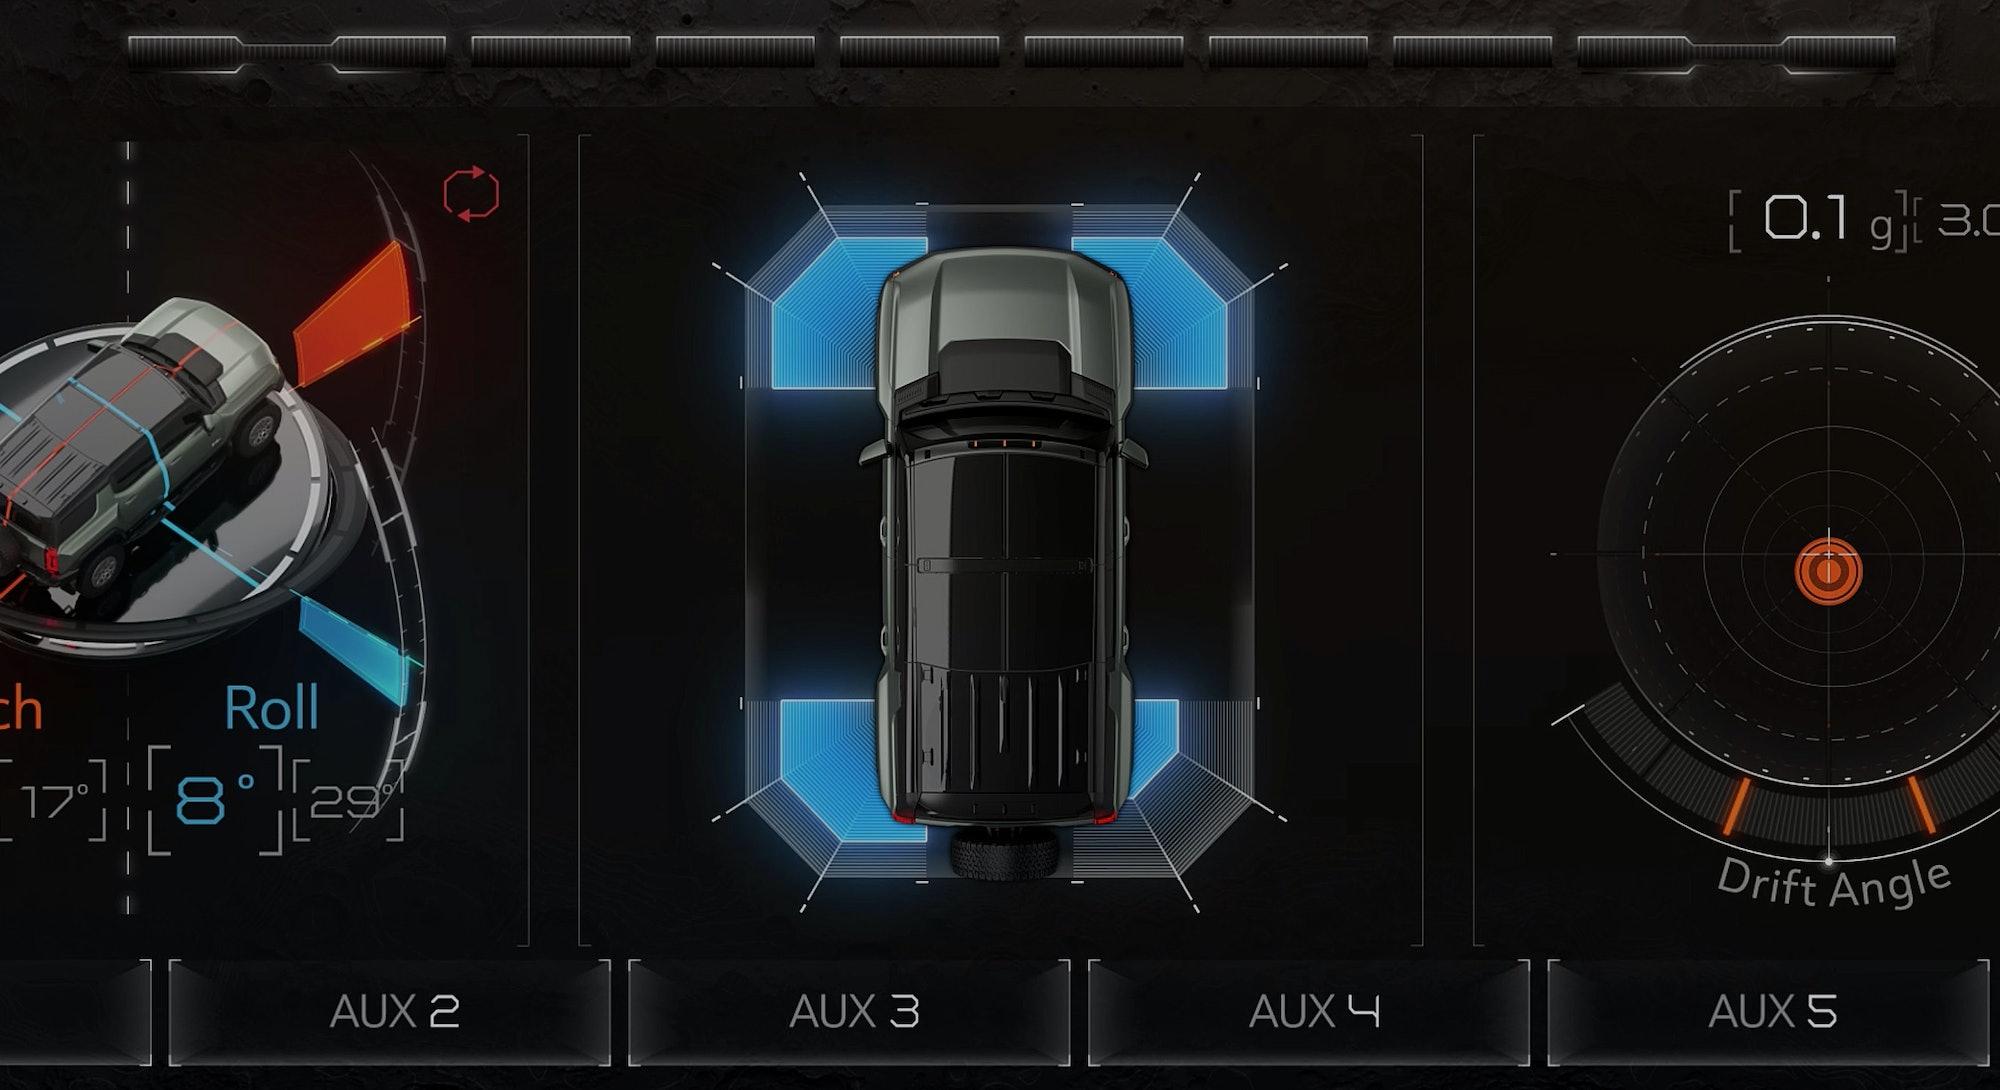 The Perception Hummer SUV UI design